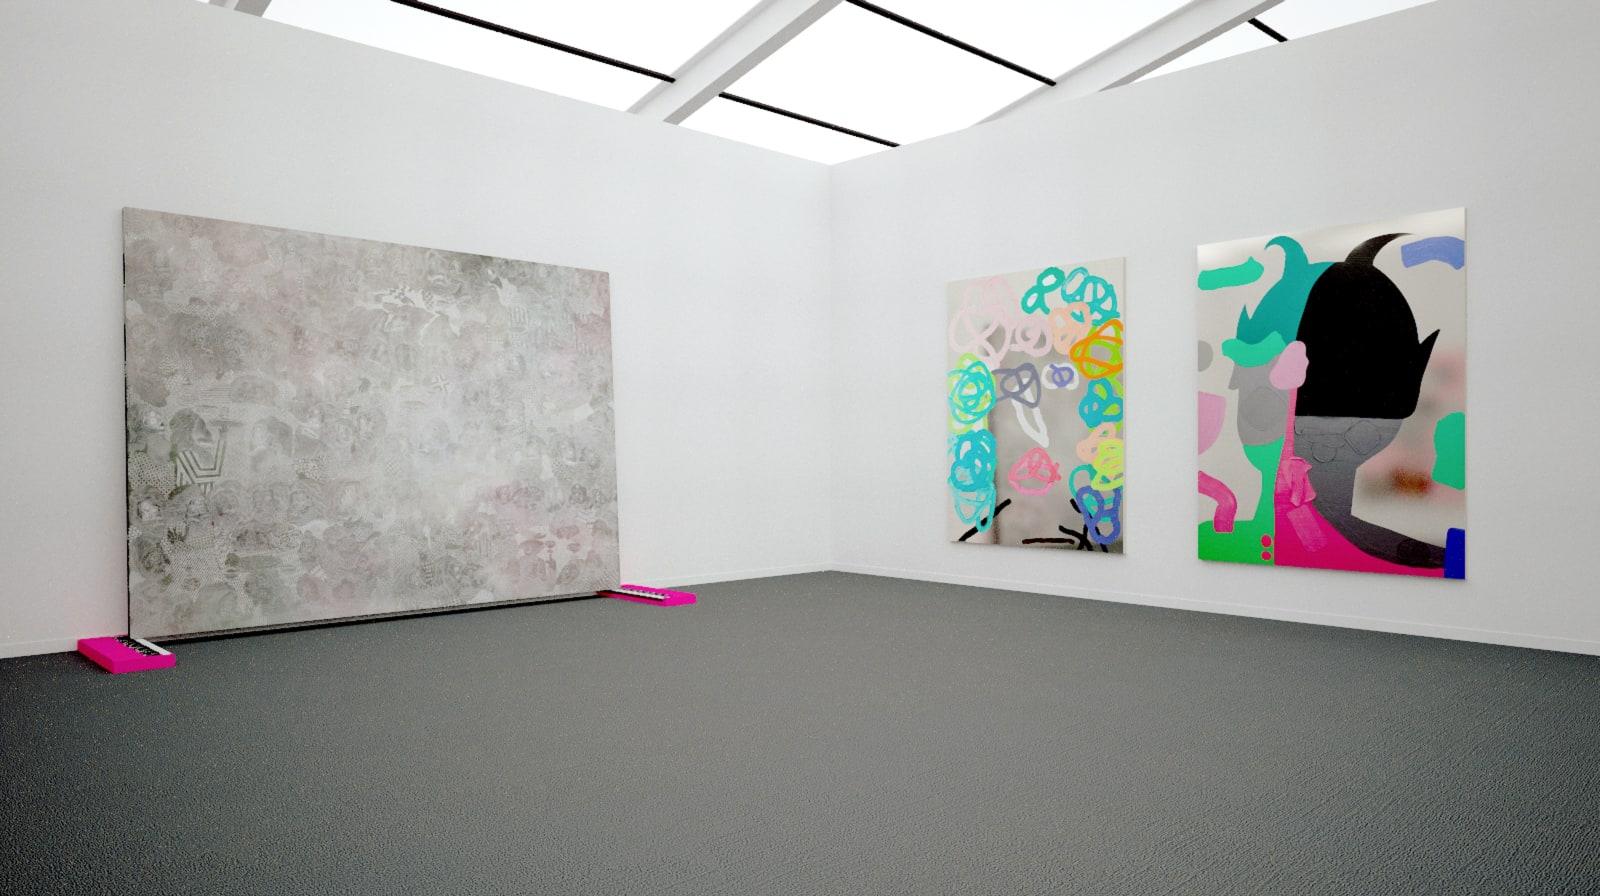 Works by José Lerma at Frieze New York (installtion view), 2020 Kavi gupta